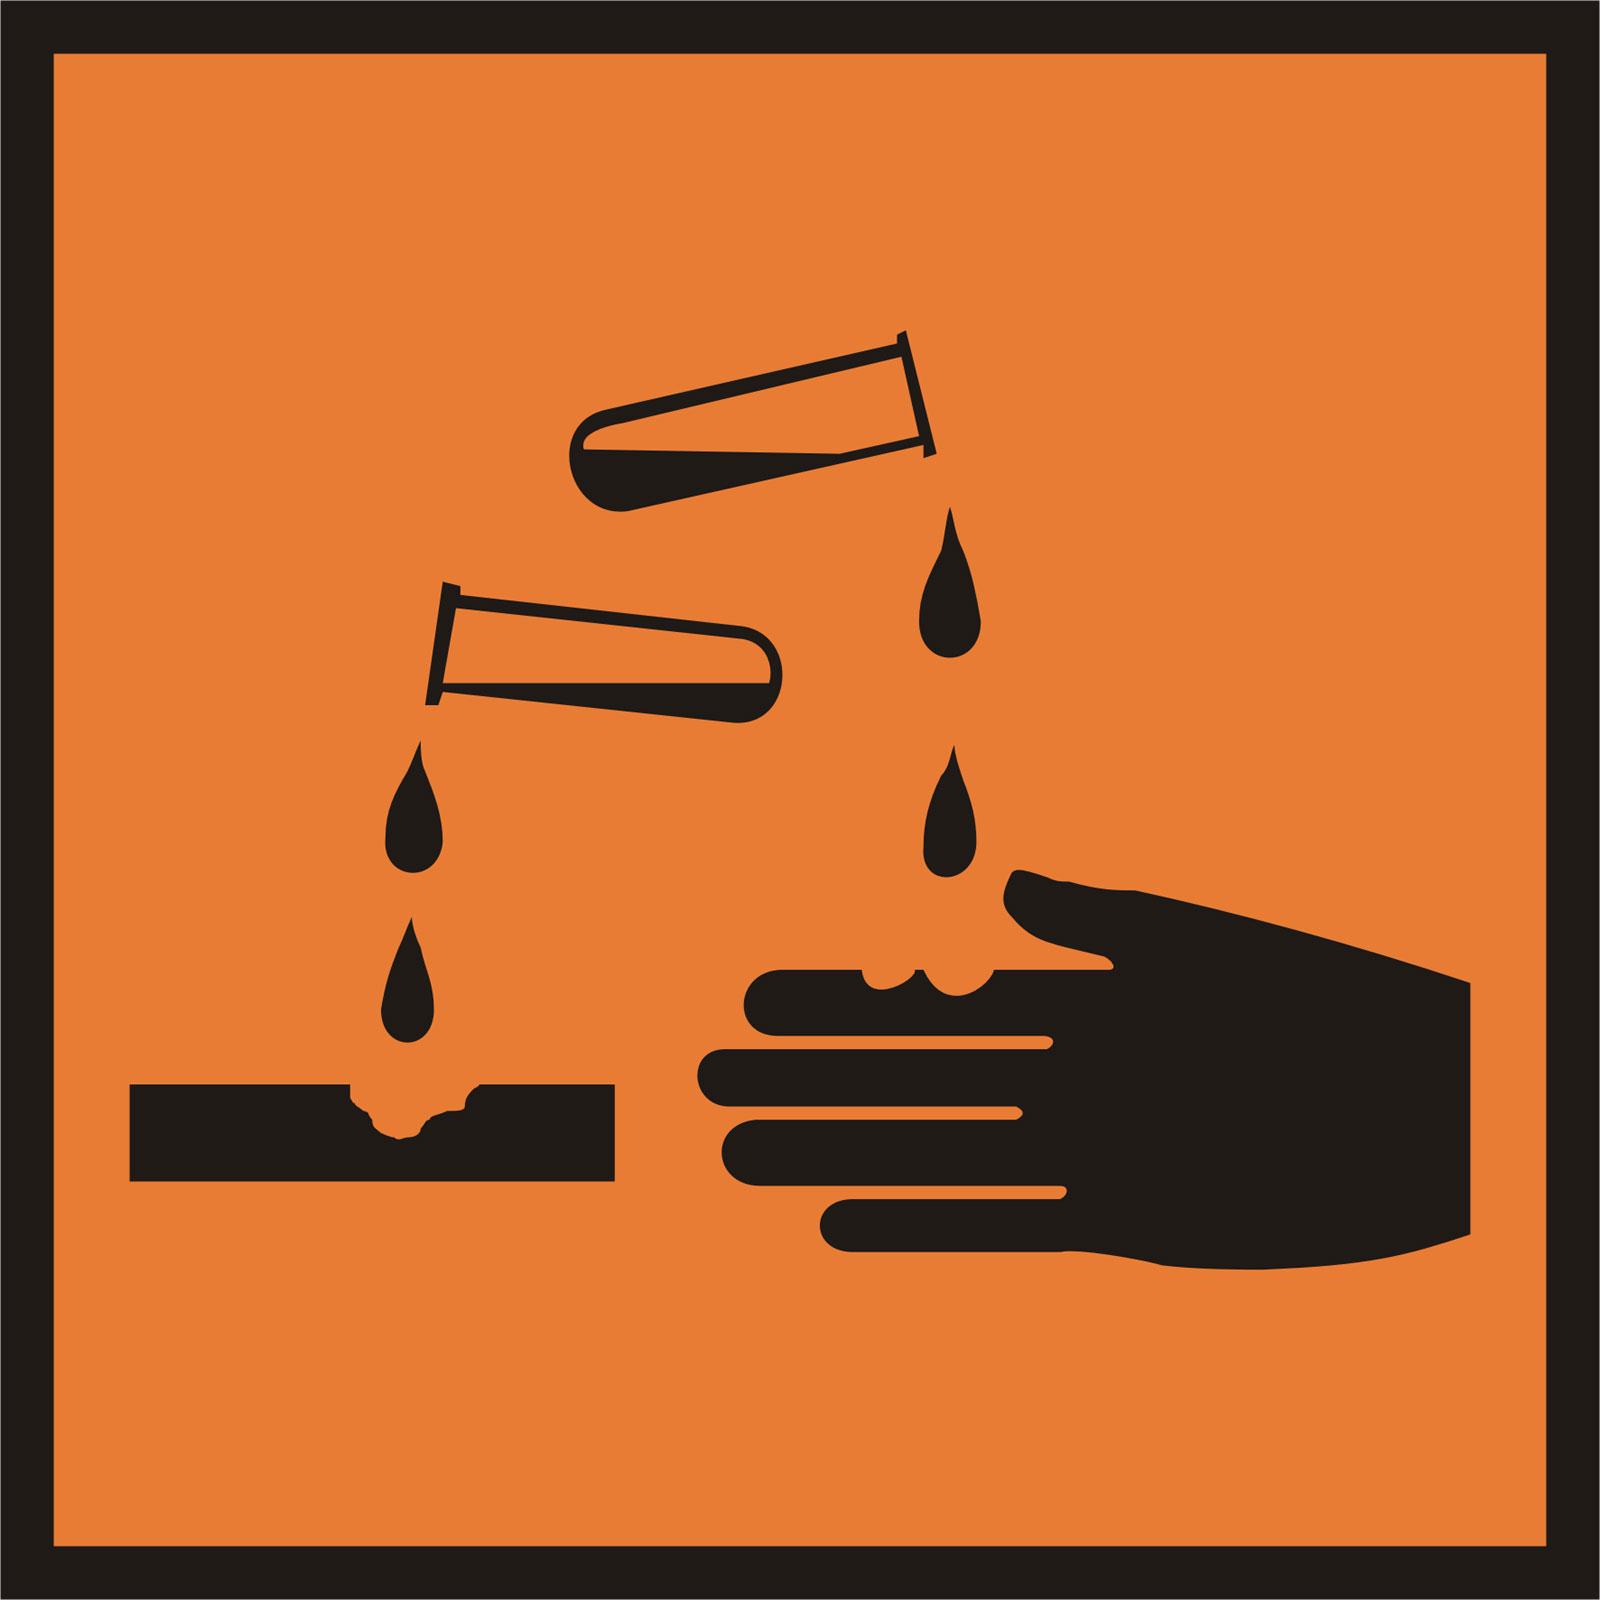 preproom org - chemical hazard signs